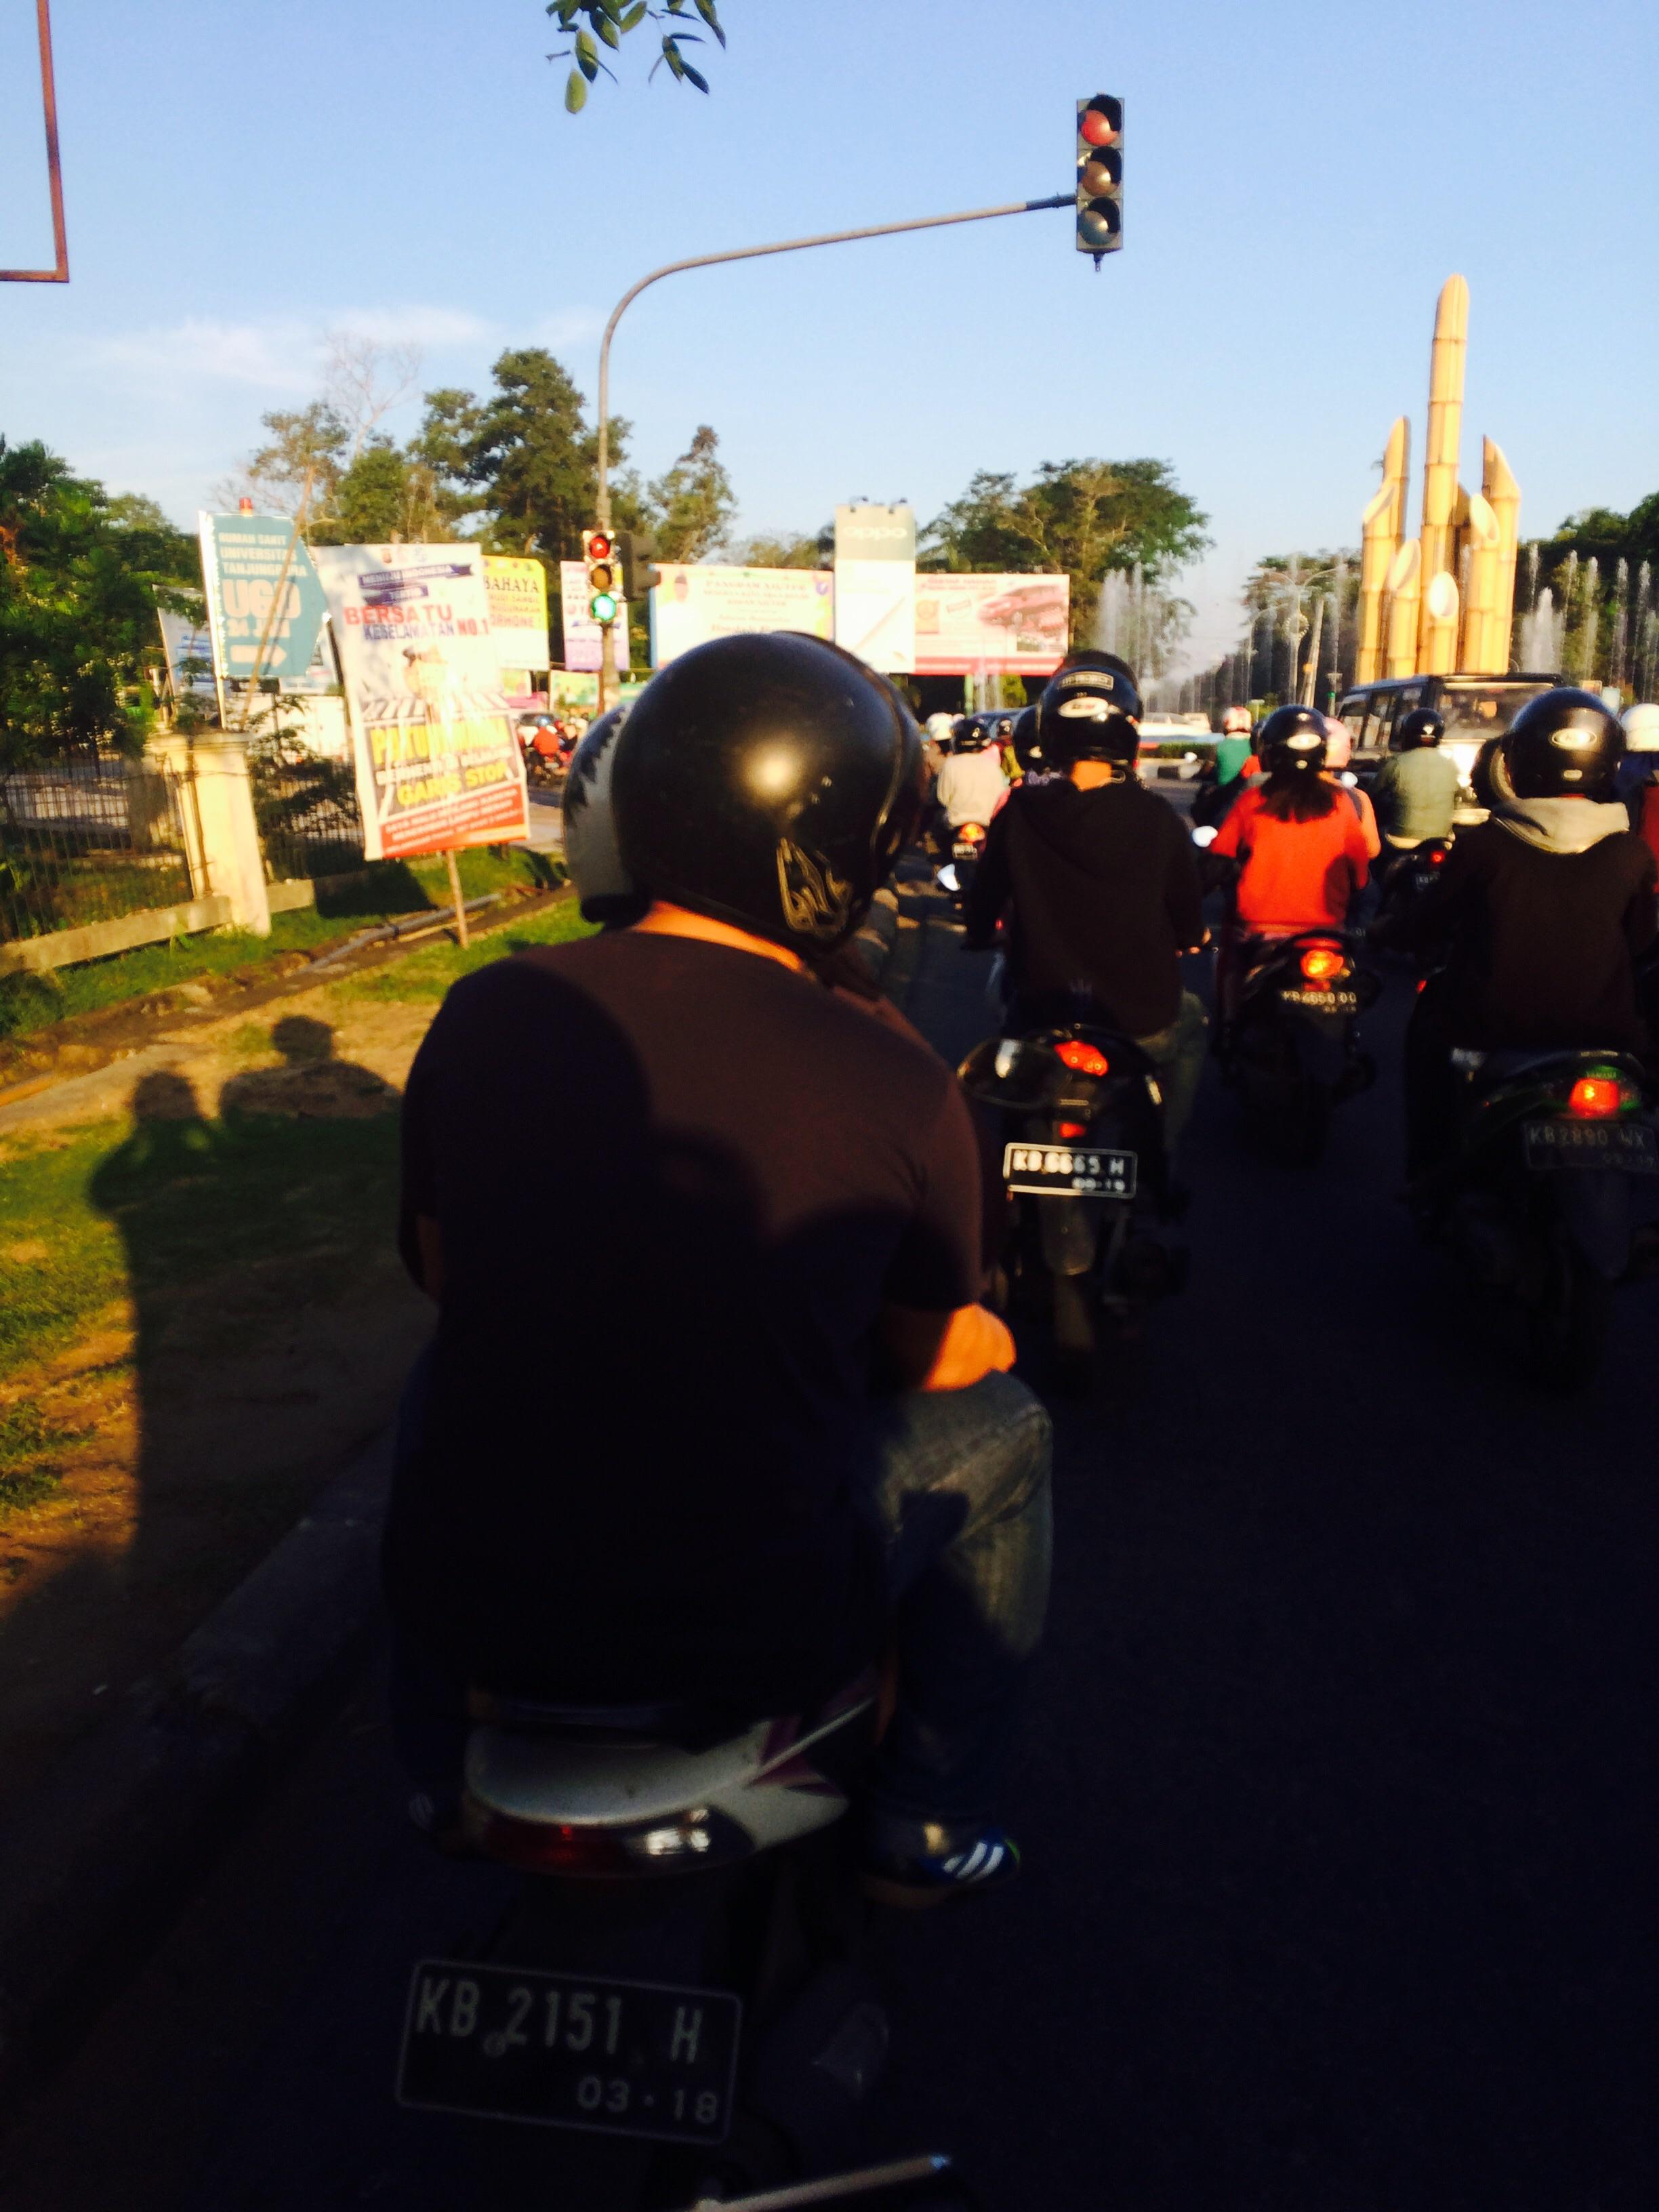 Pontianak rush hour with multitudes of motorbikes.